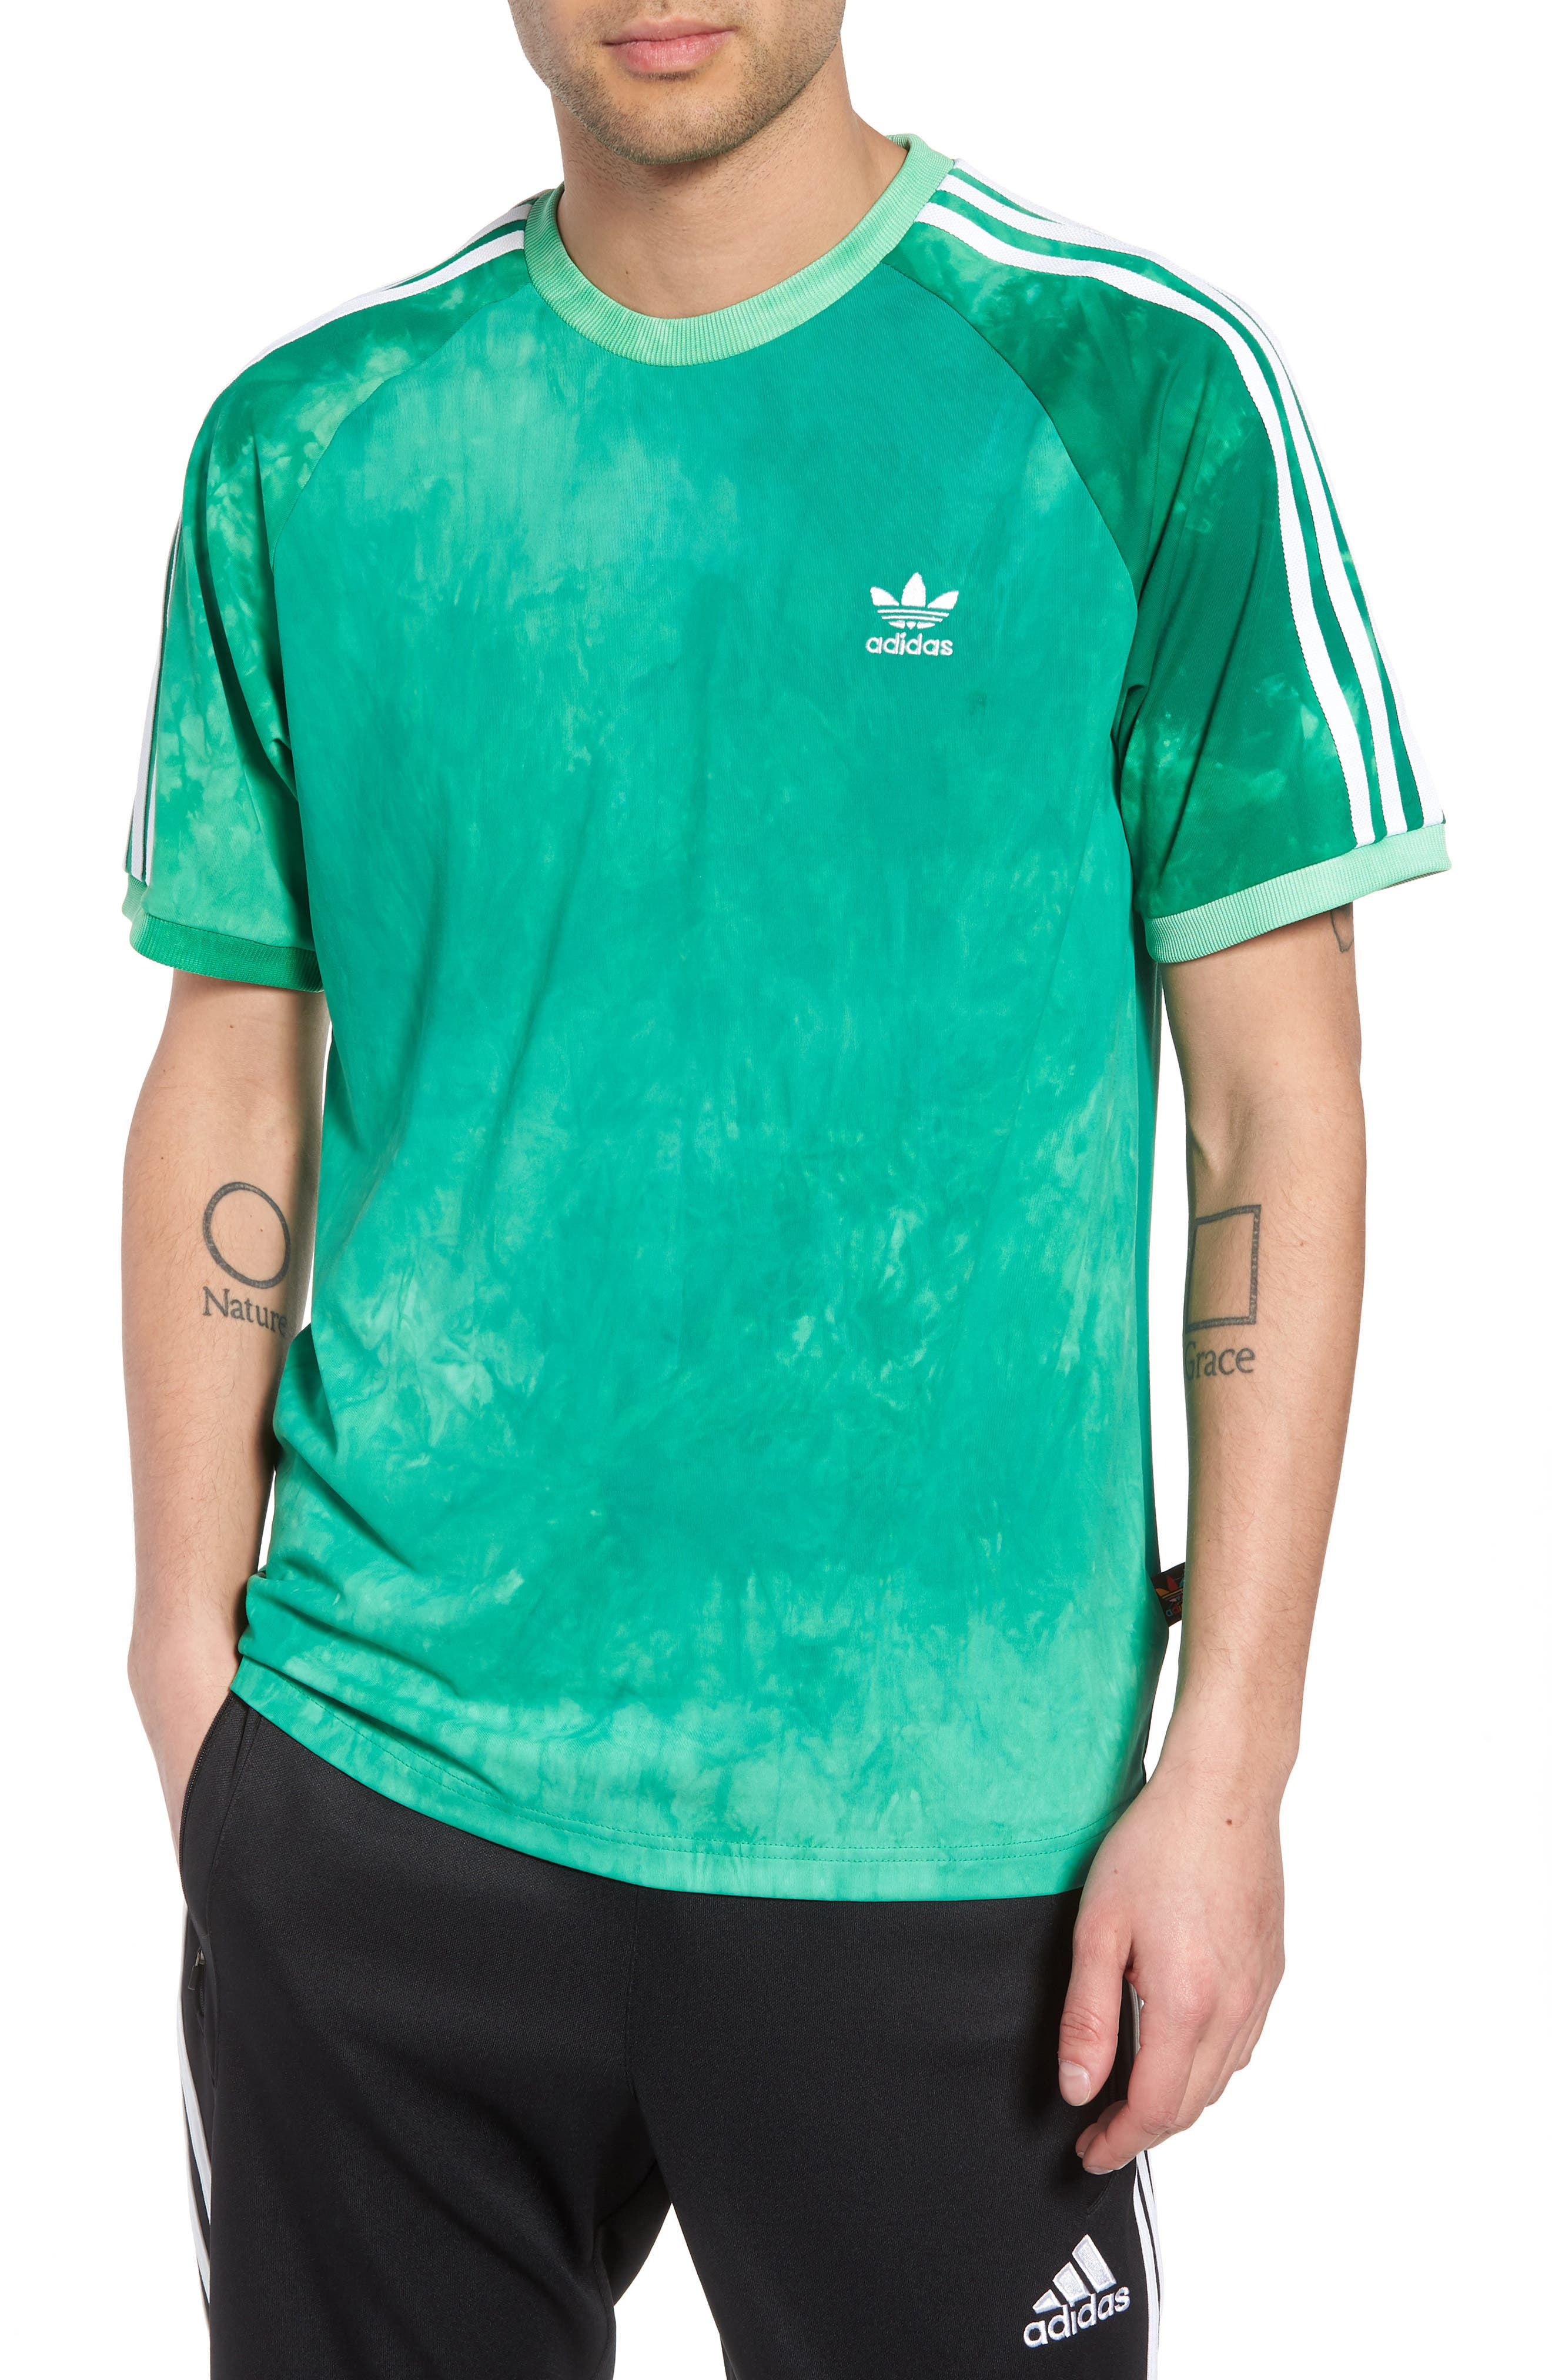 adidas Originals Hu Holi T-Shirt